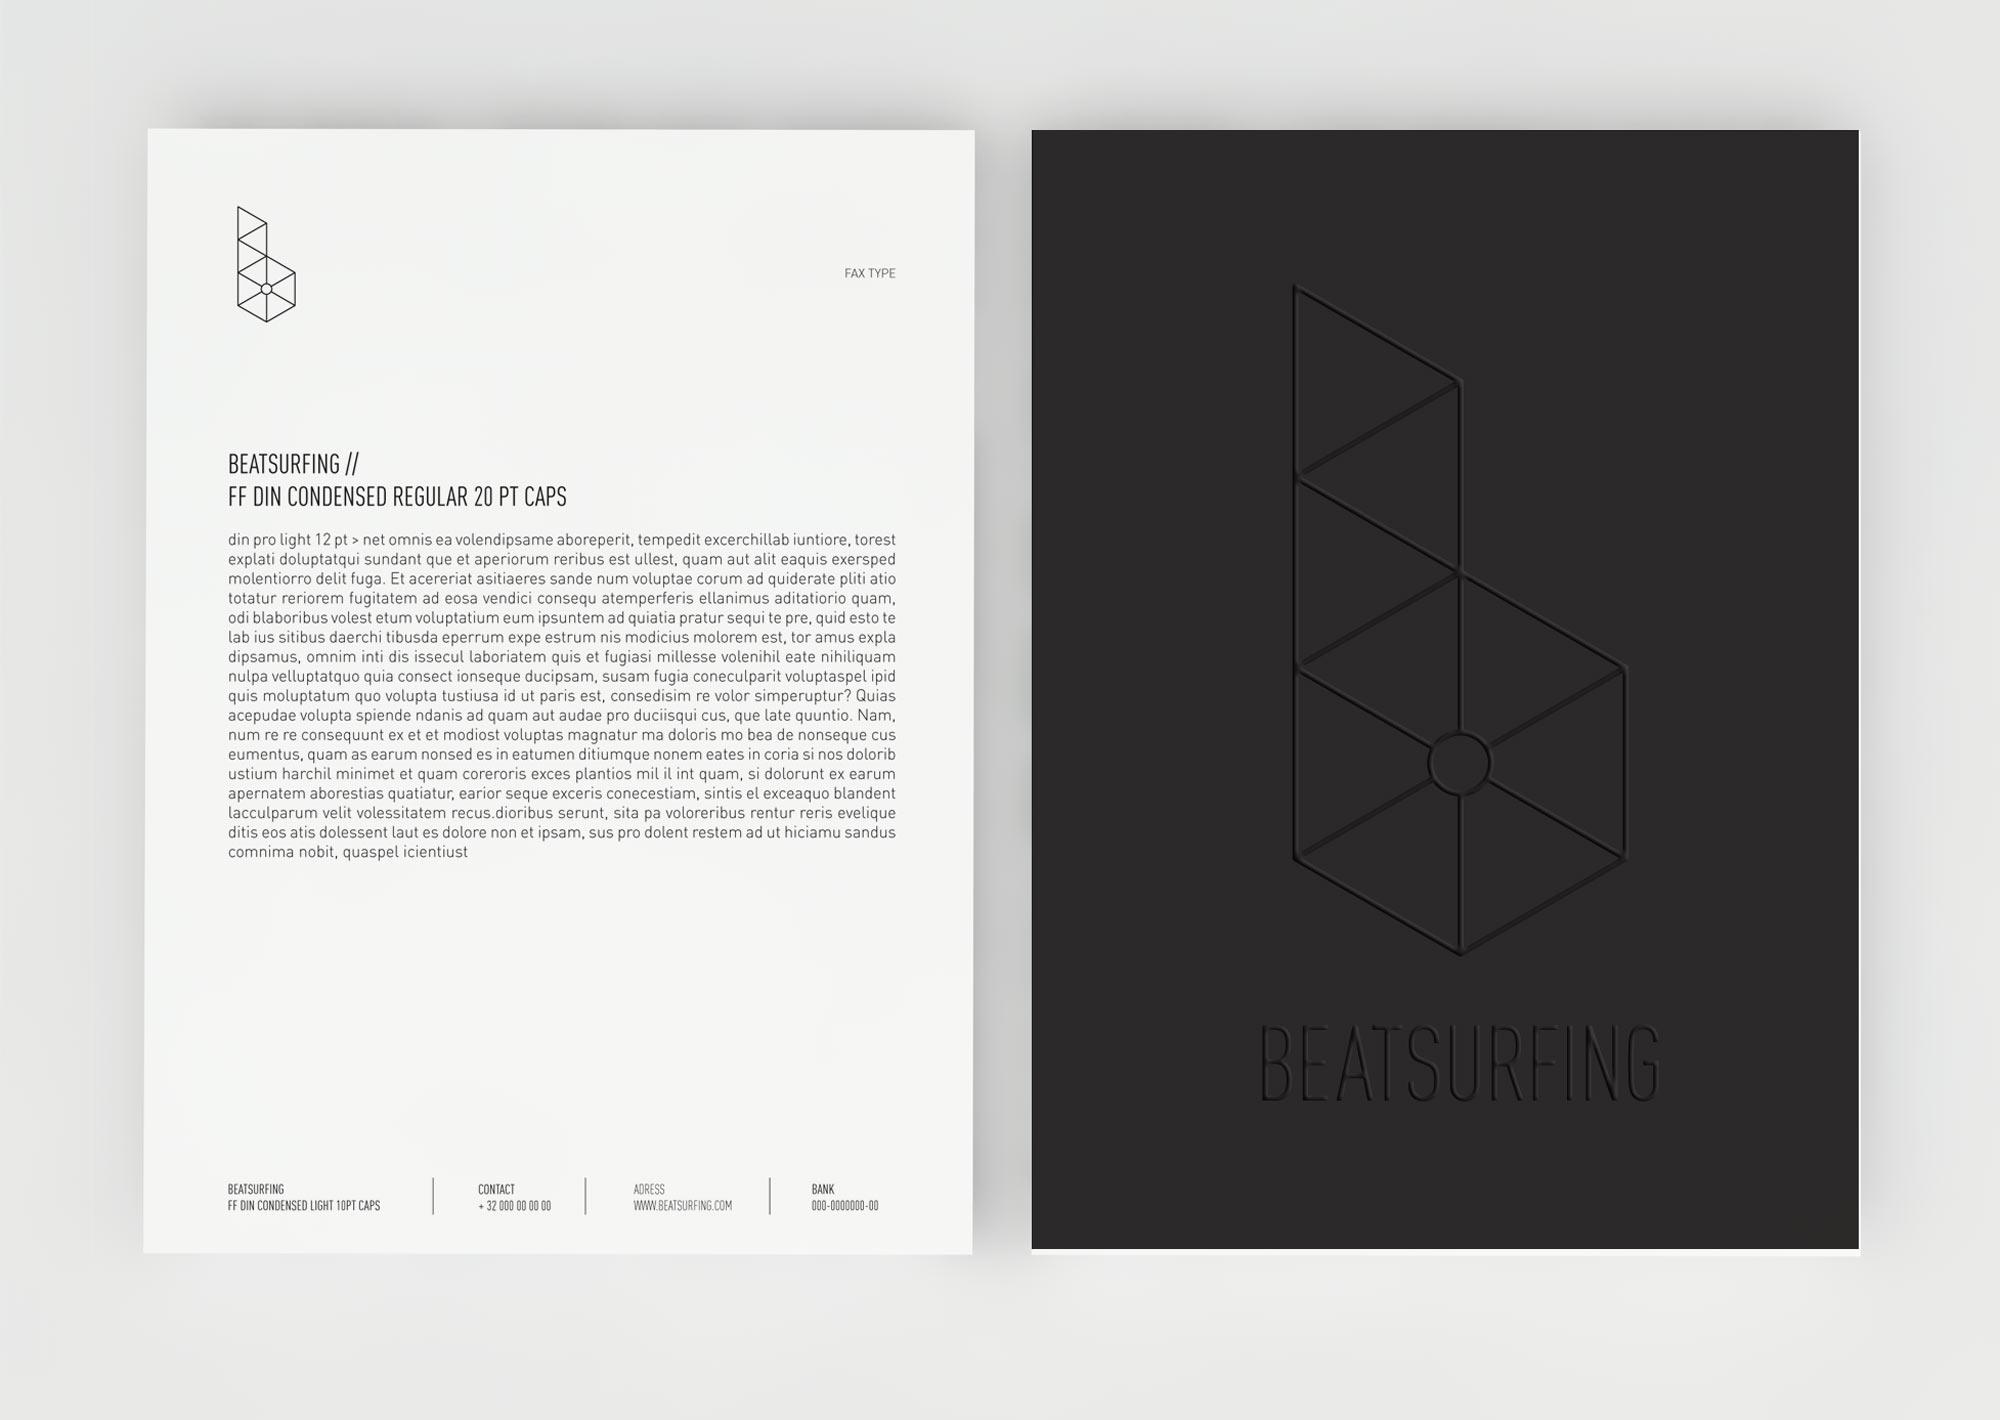 beatsurfing_letter_fax.jpg